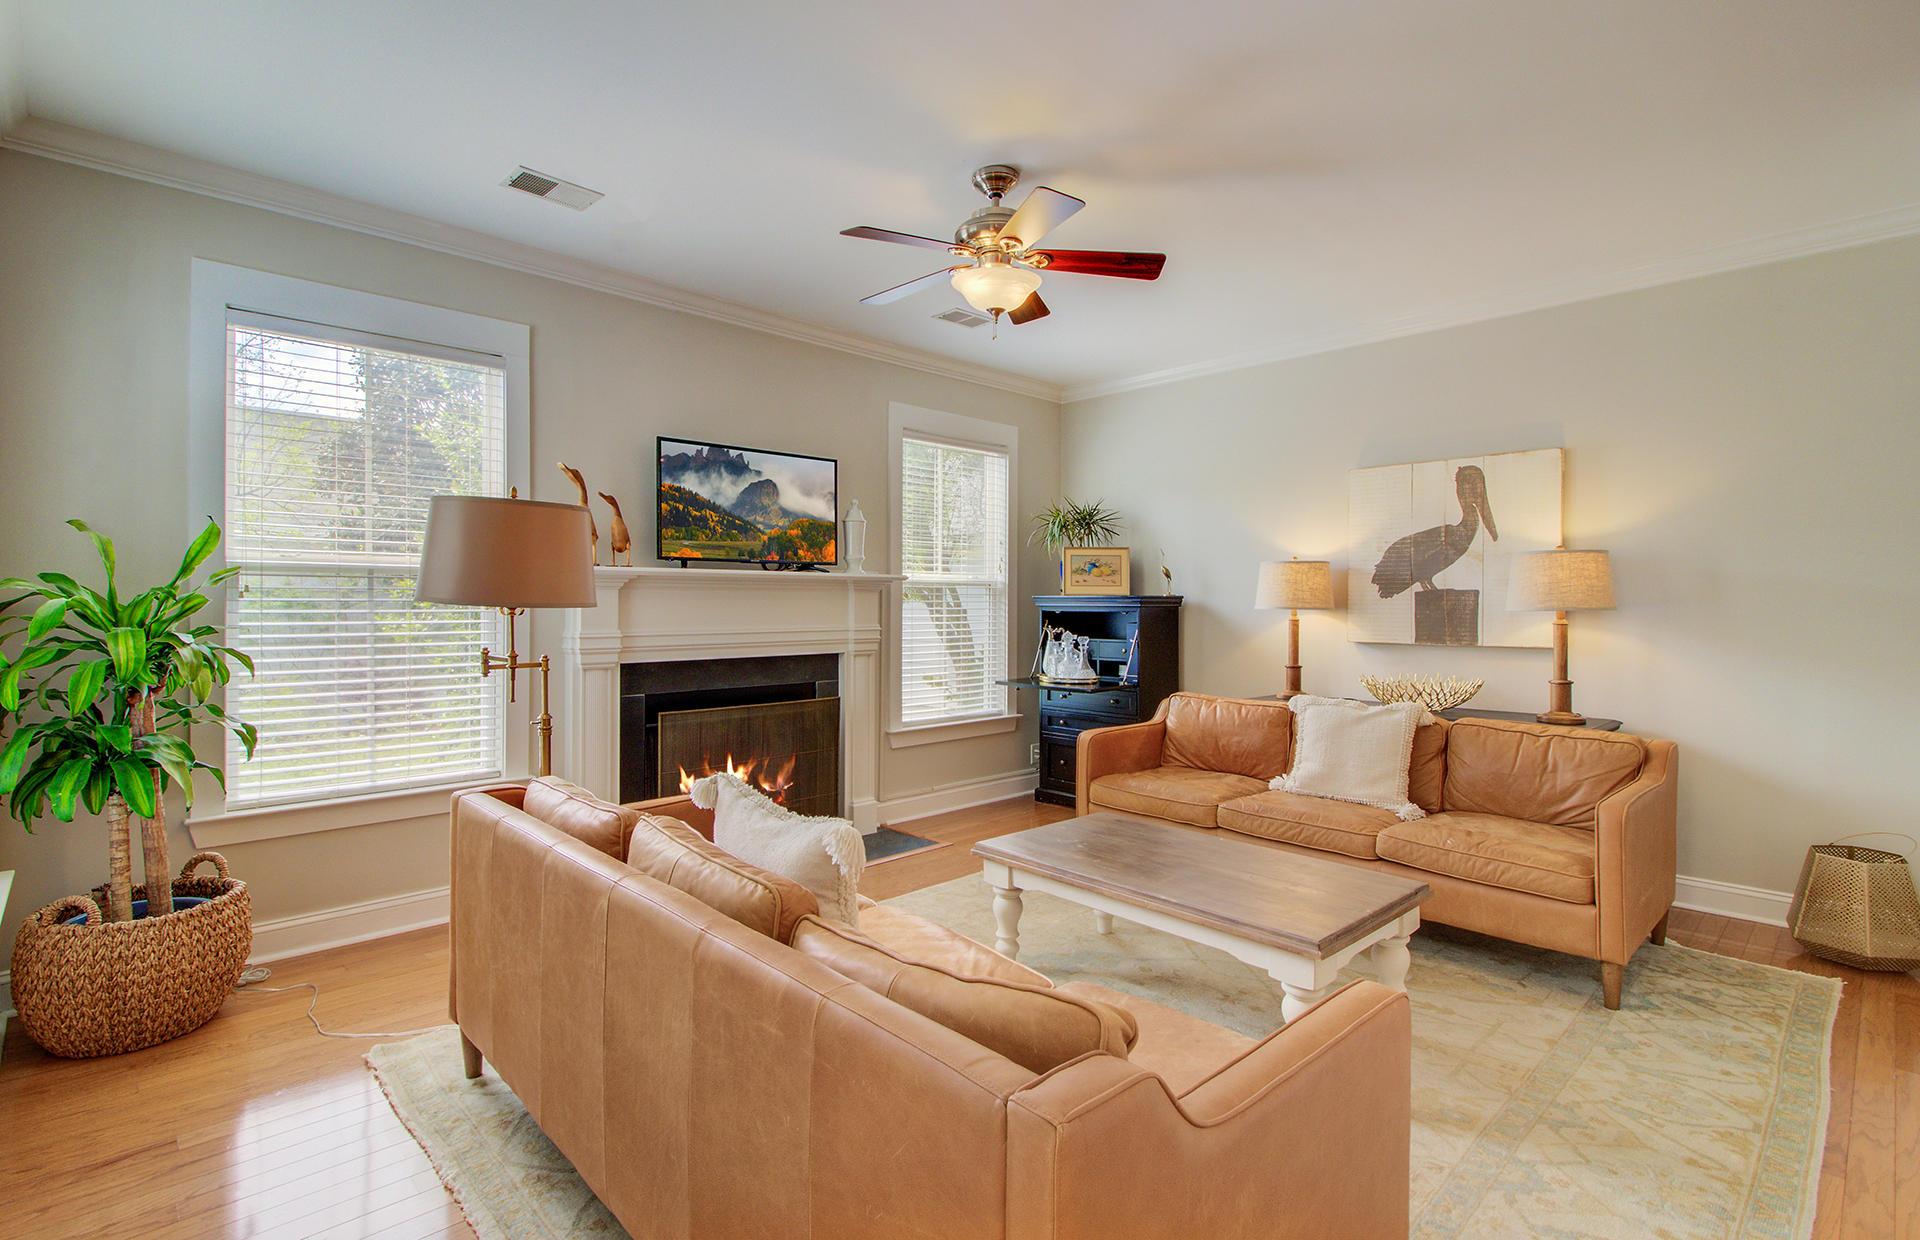 New Parrish Village Homes For Sale - 1109 Dawn View, Mount Pleasant, SC - 14